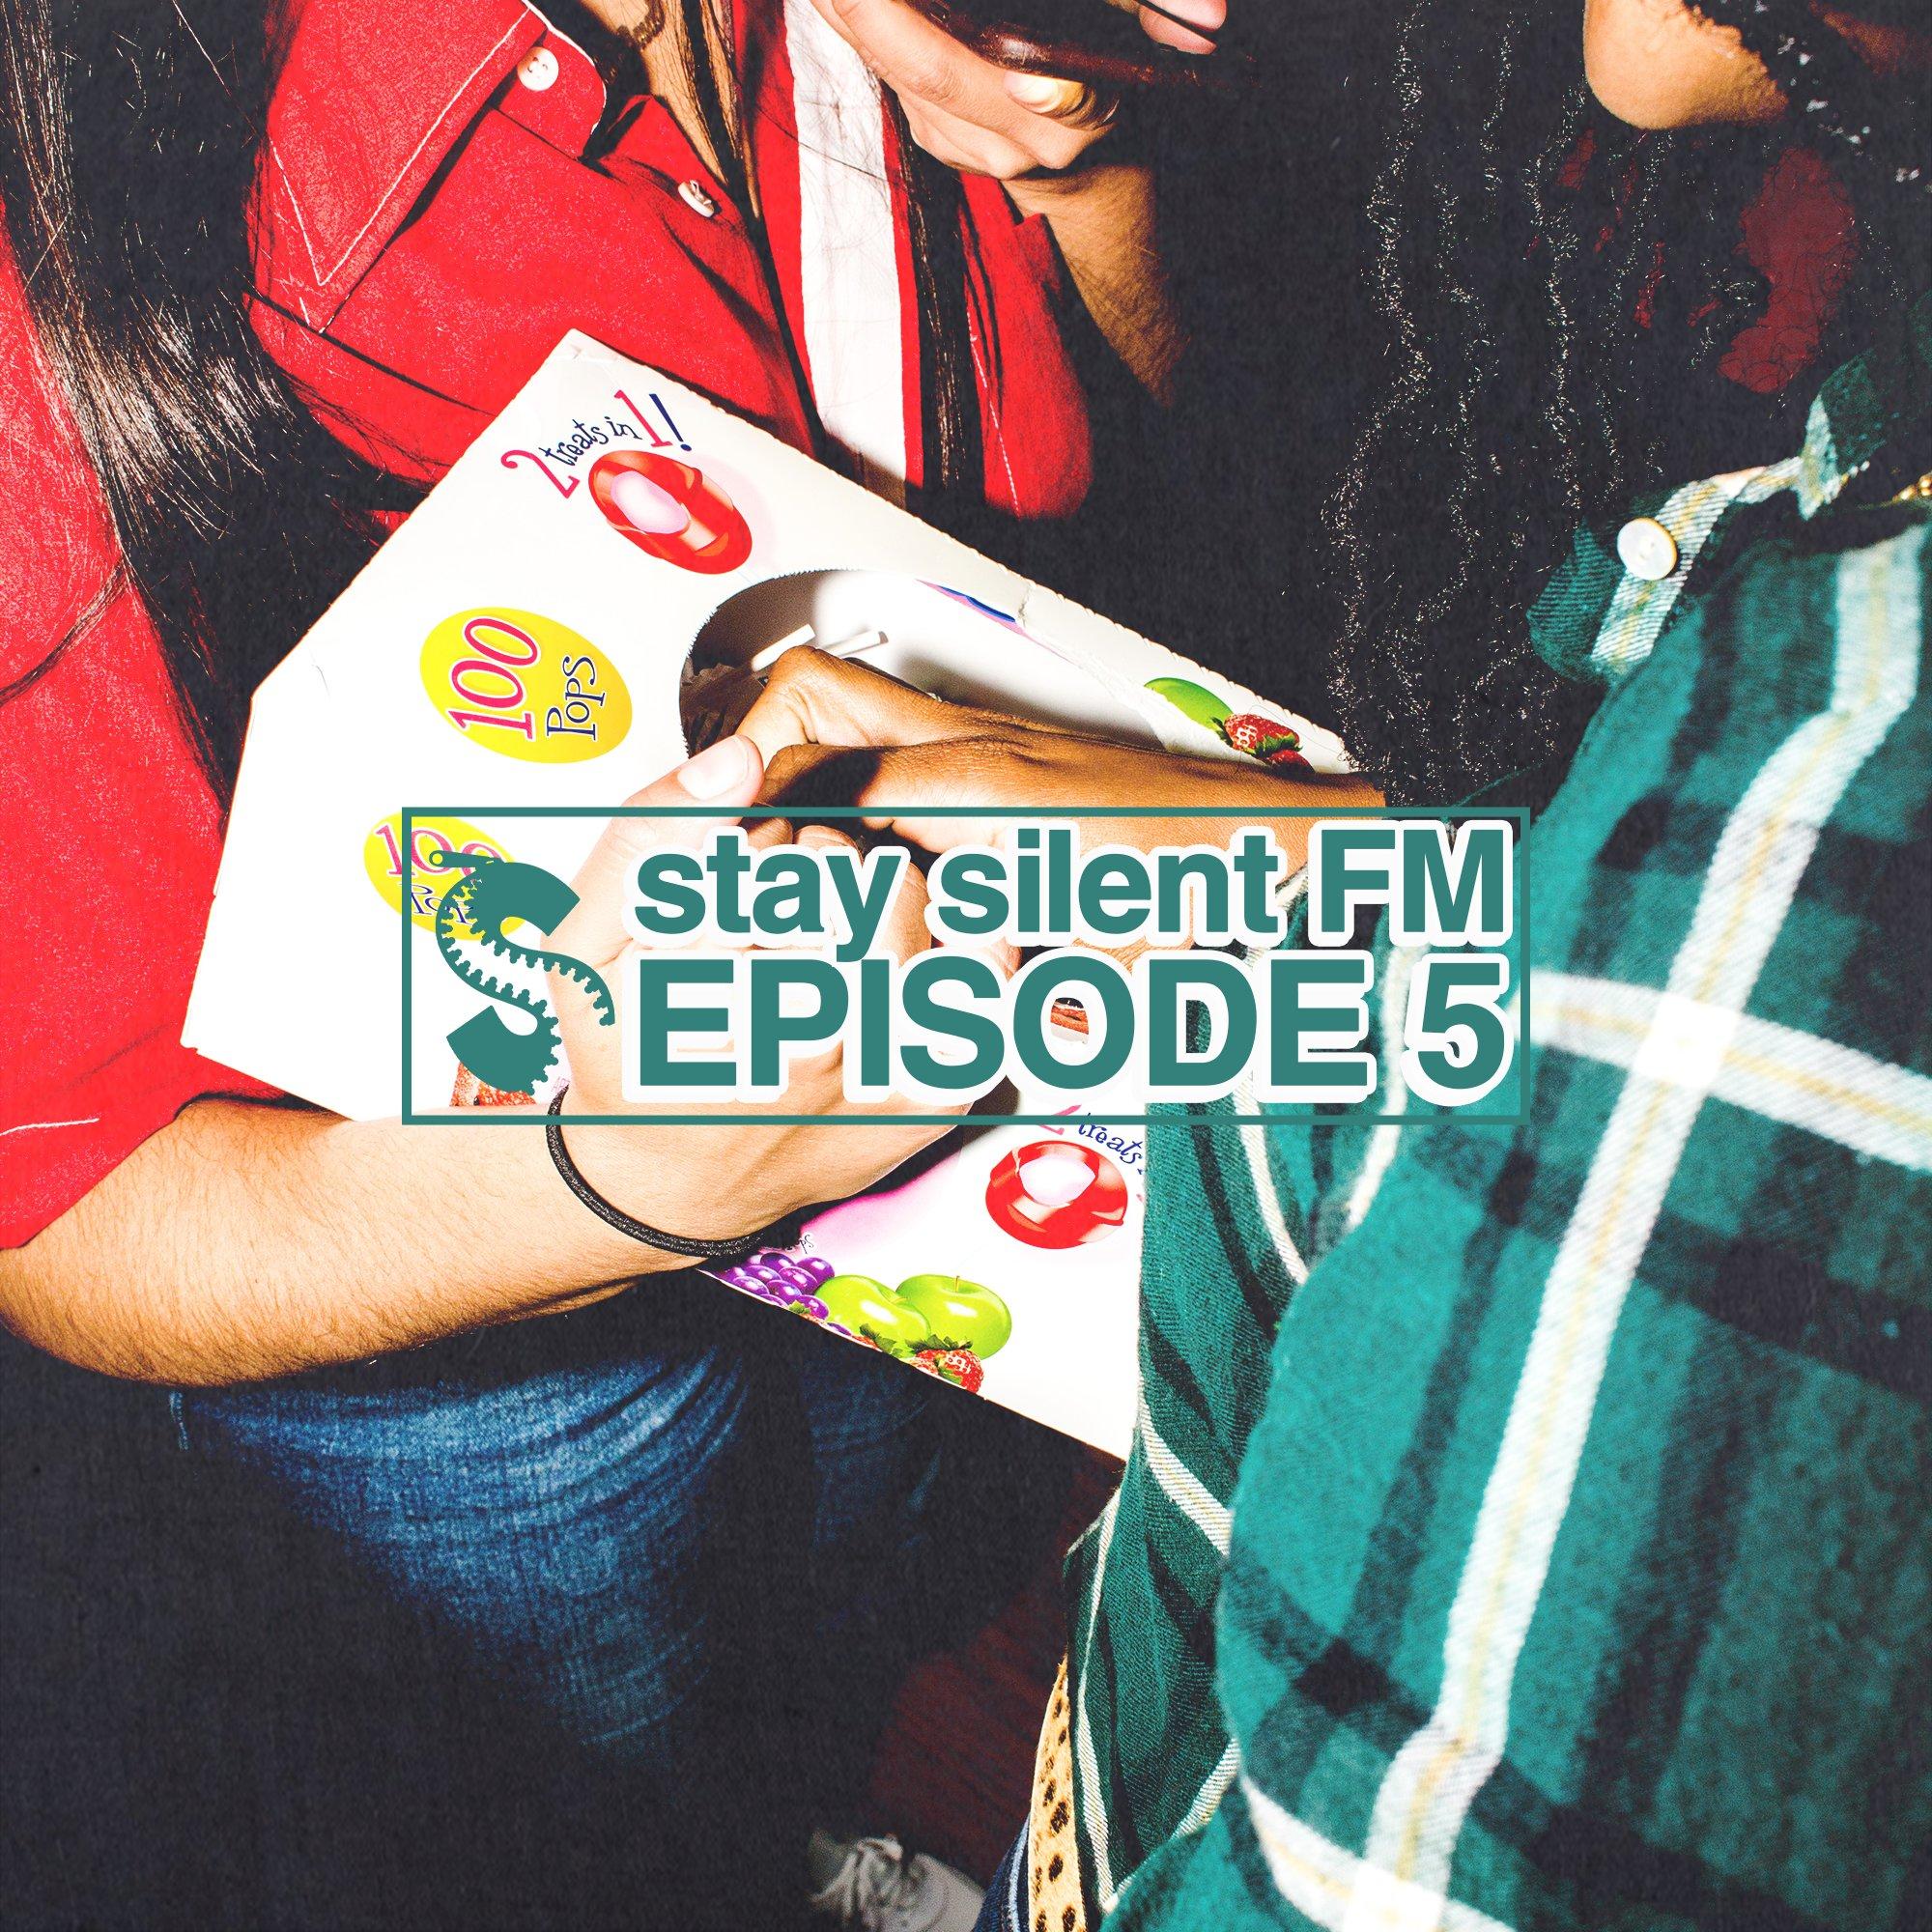 rsz_stay_silent_fm_episode_5.jpg